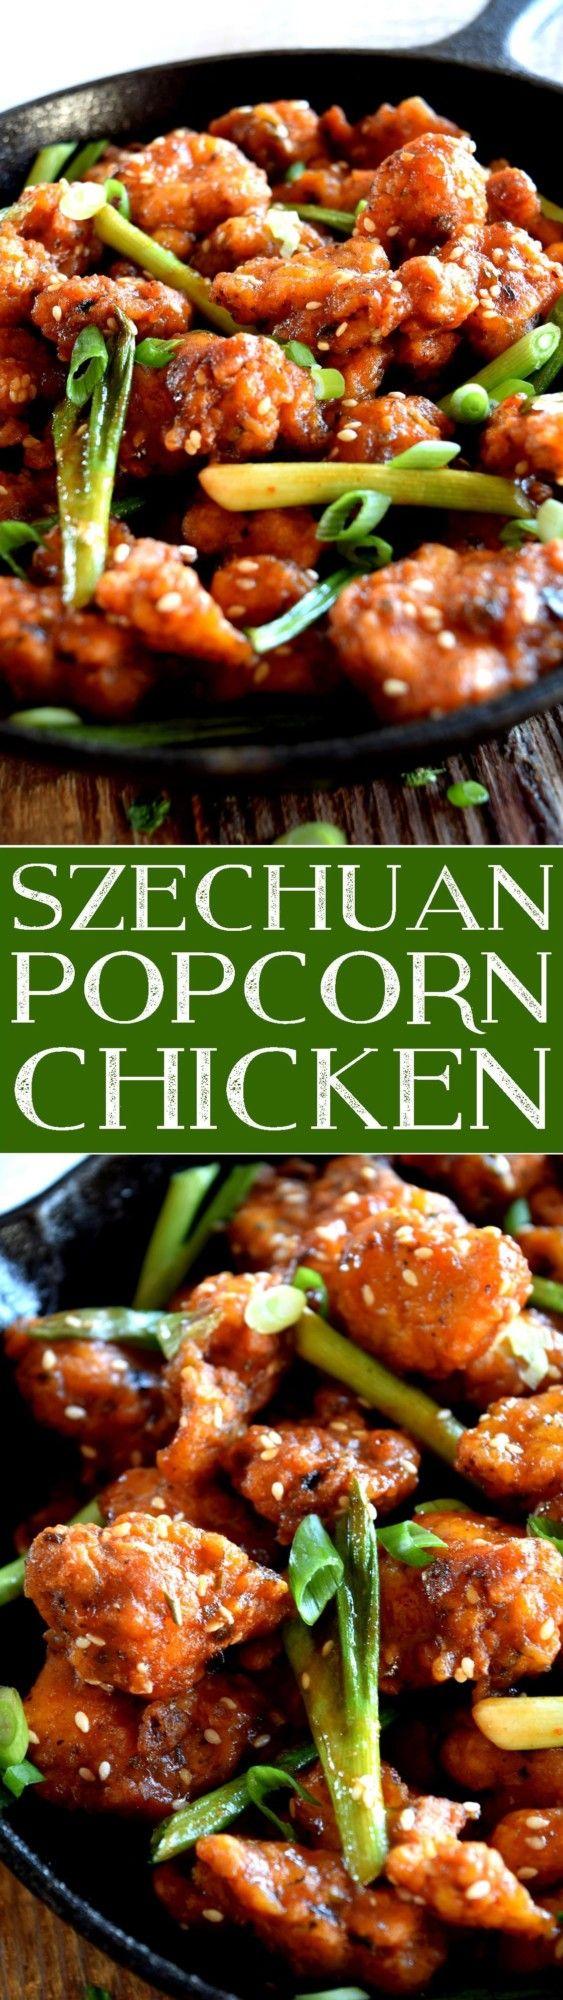 szechuan-popcorn-chicken   Recipes   Pinterest   Comida china ...